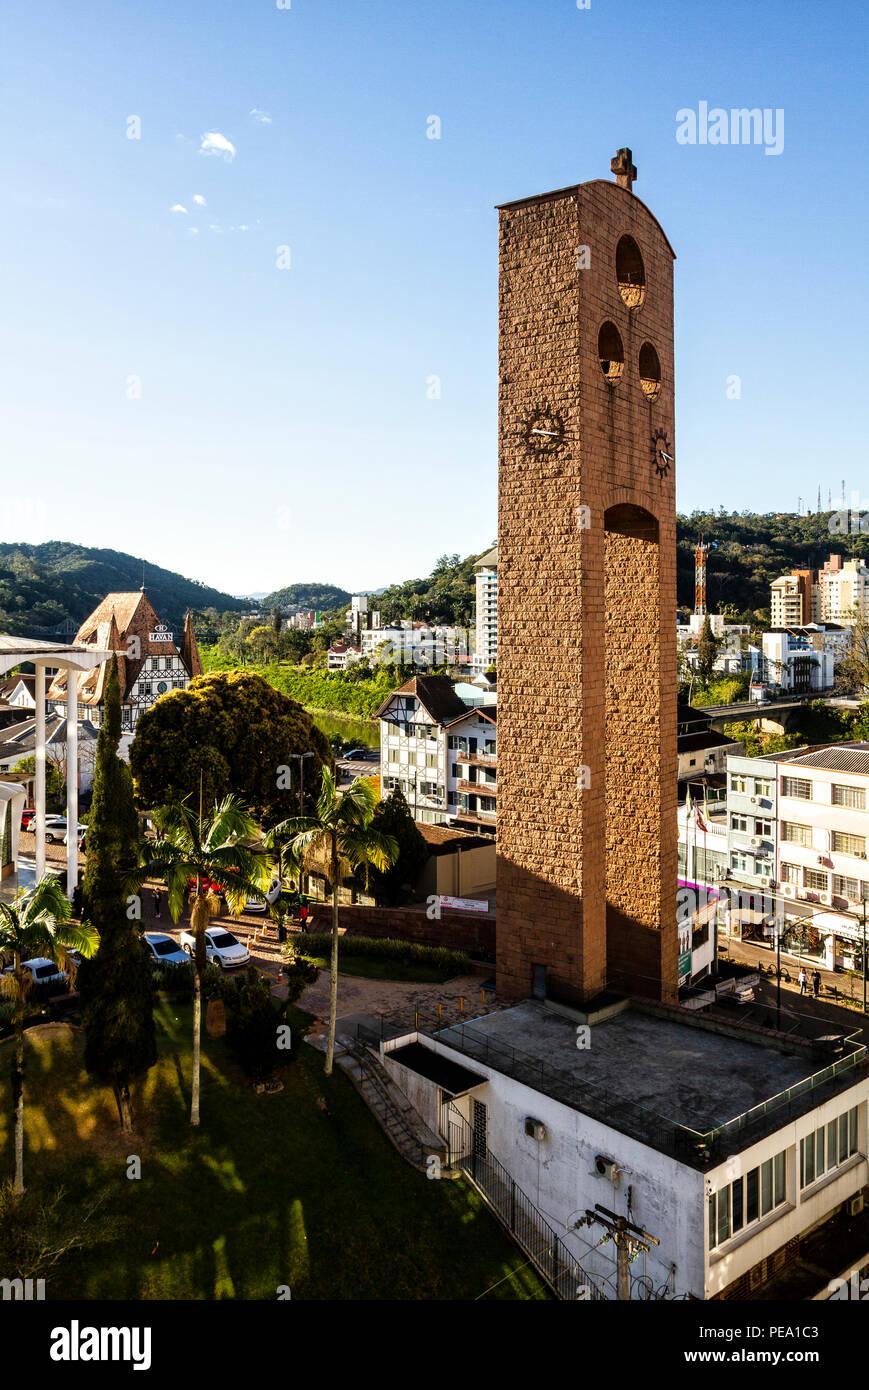 Sao Paulo Apostolo Cattedrale. Blumenau, Santa Catarina, Brasile. Immagini Stock